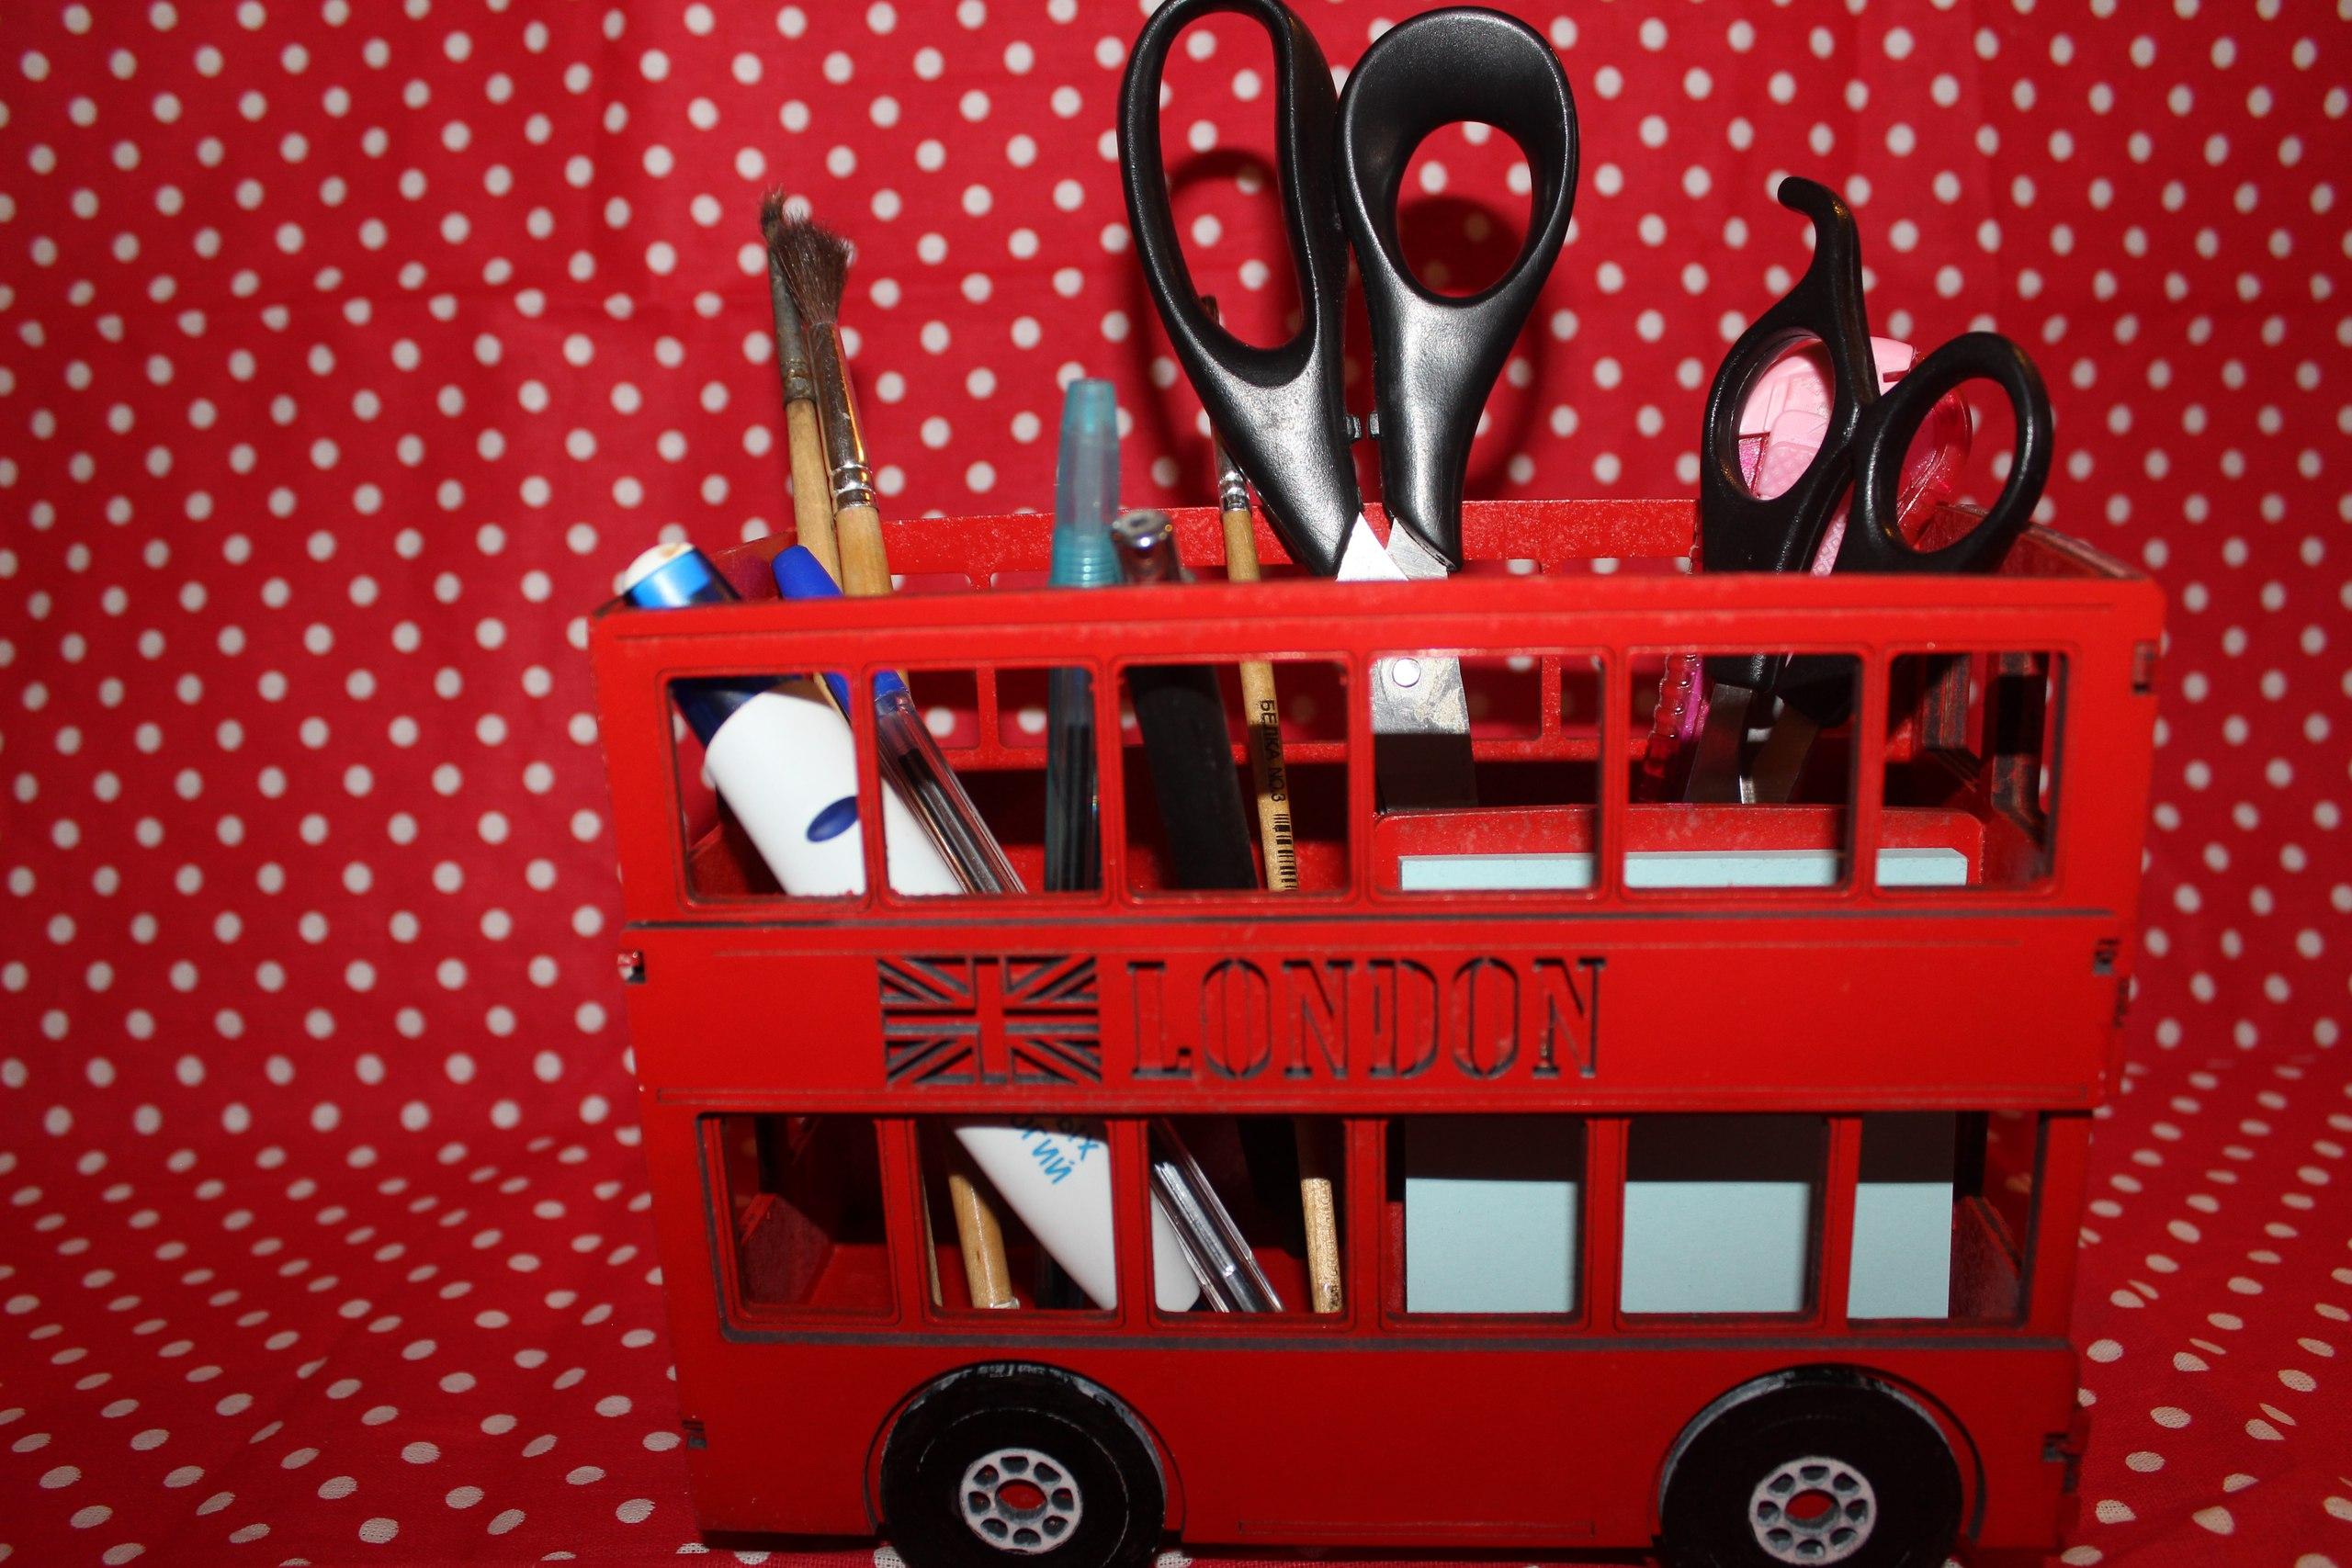 London Bus 3mm DXF File